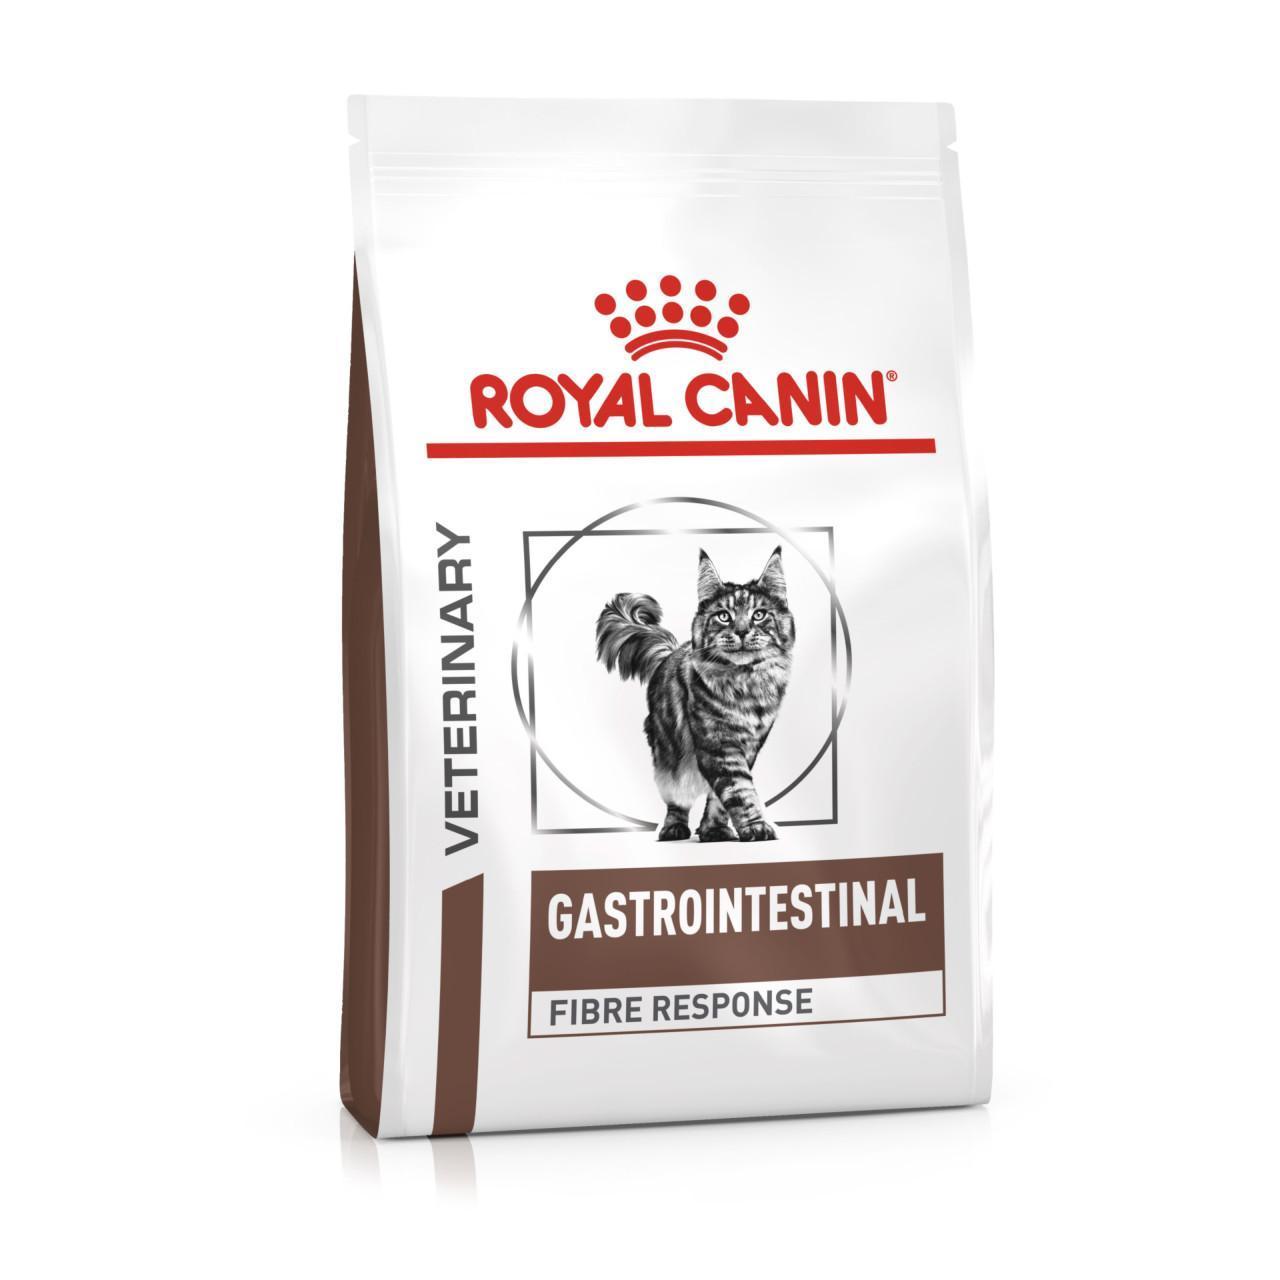 An image of Royal Canin Feline Gastro-Intestinal Fibre Response